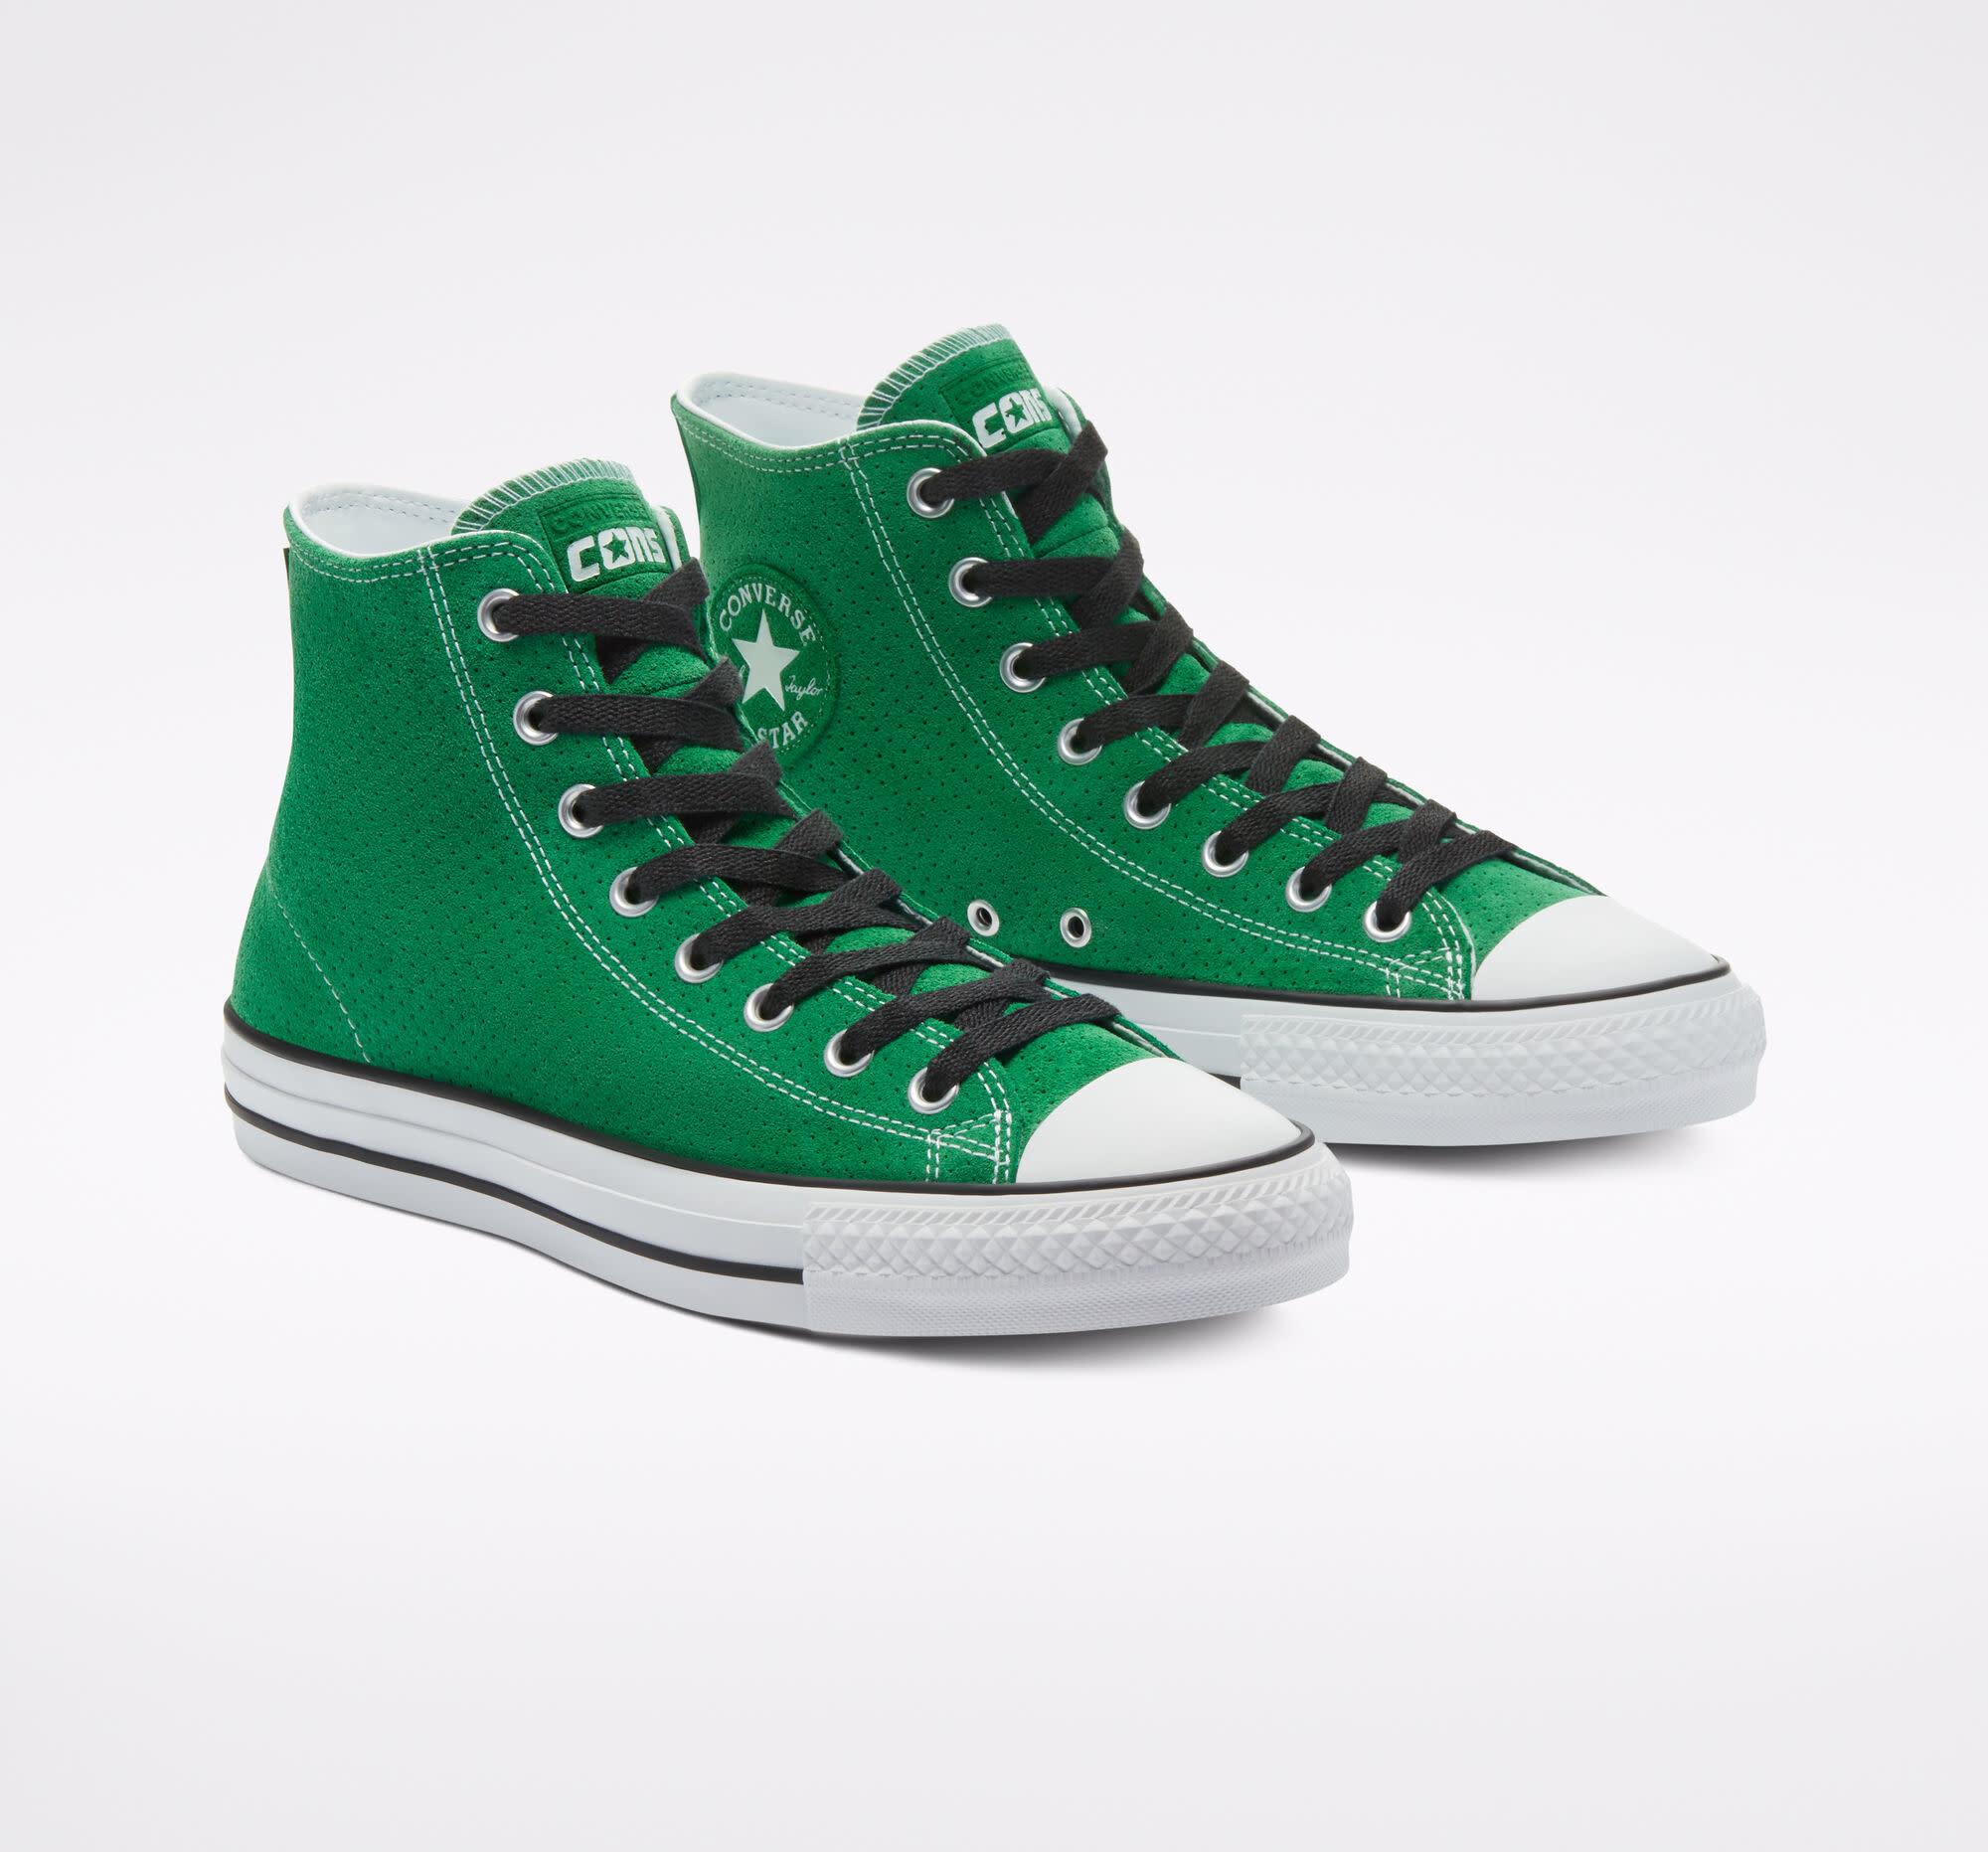 Converse USA Inc. CTAS Pro HI Perforated Green/Black/White